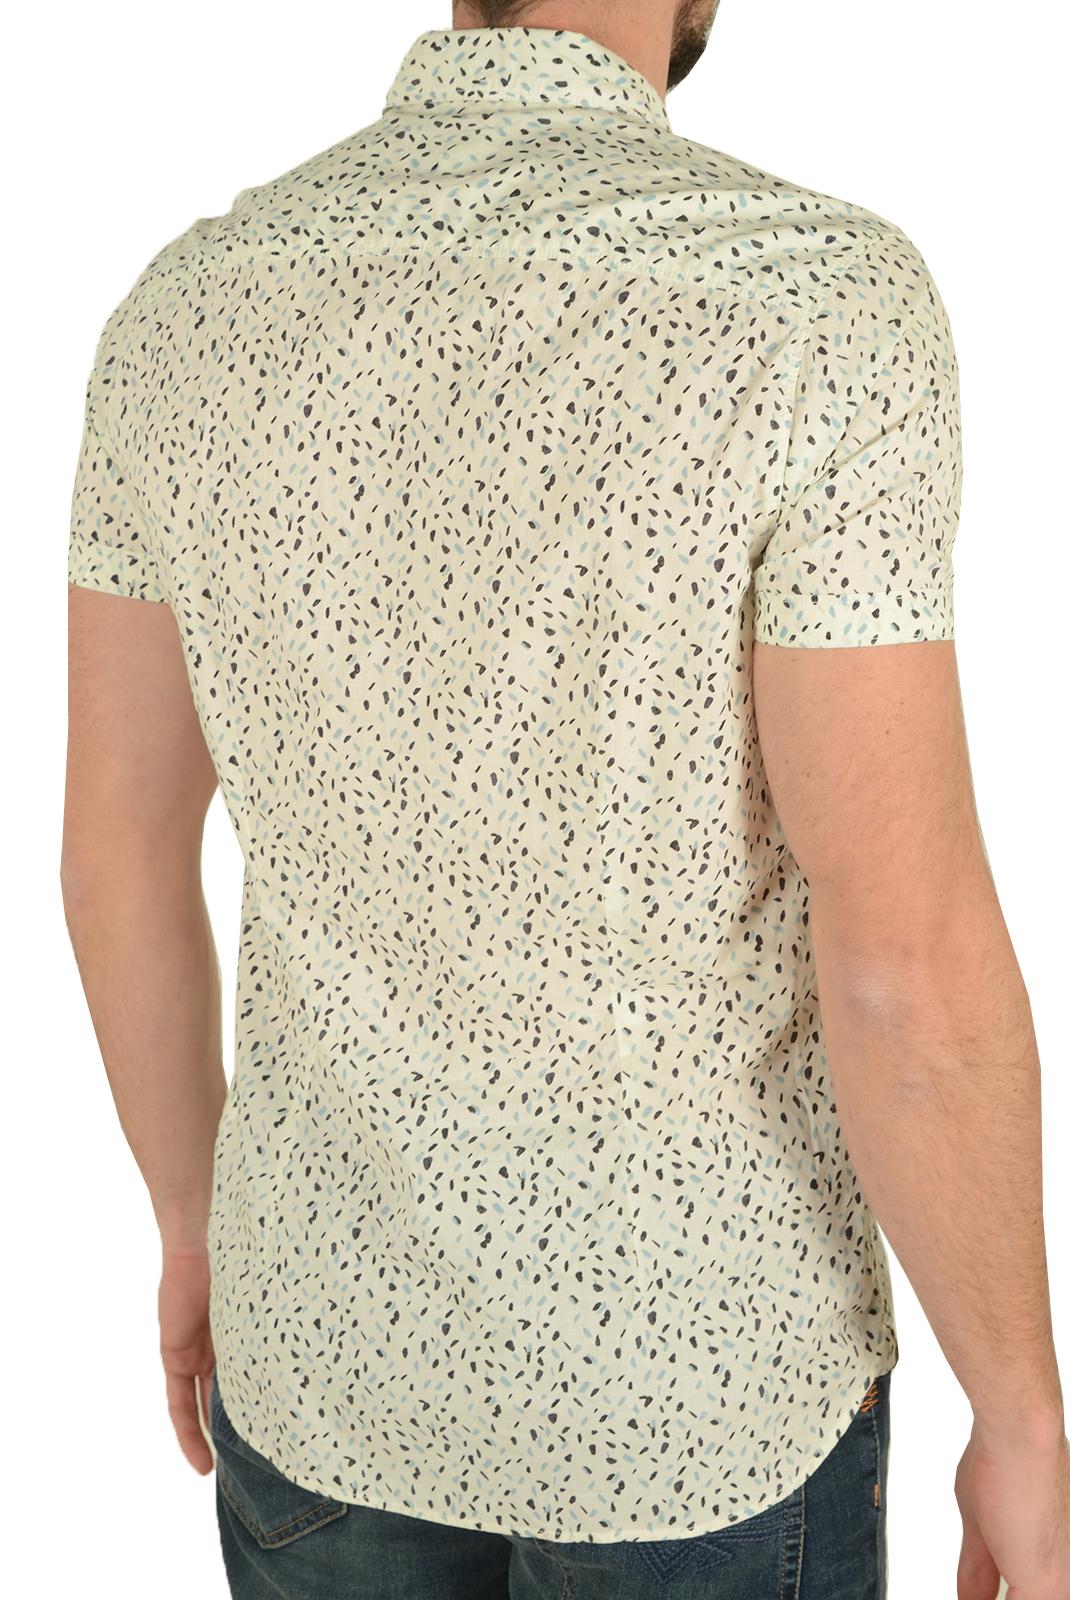 Chemises   Pepe jeans PM302921 LLAMA 803 OFF WHITE